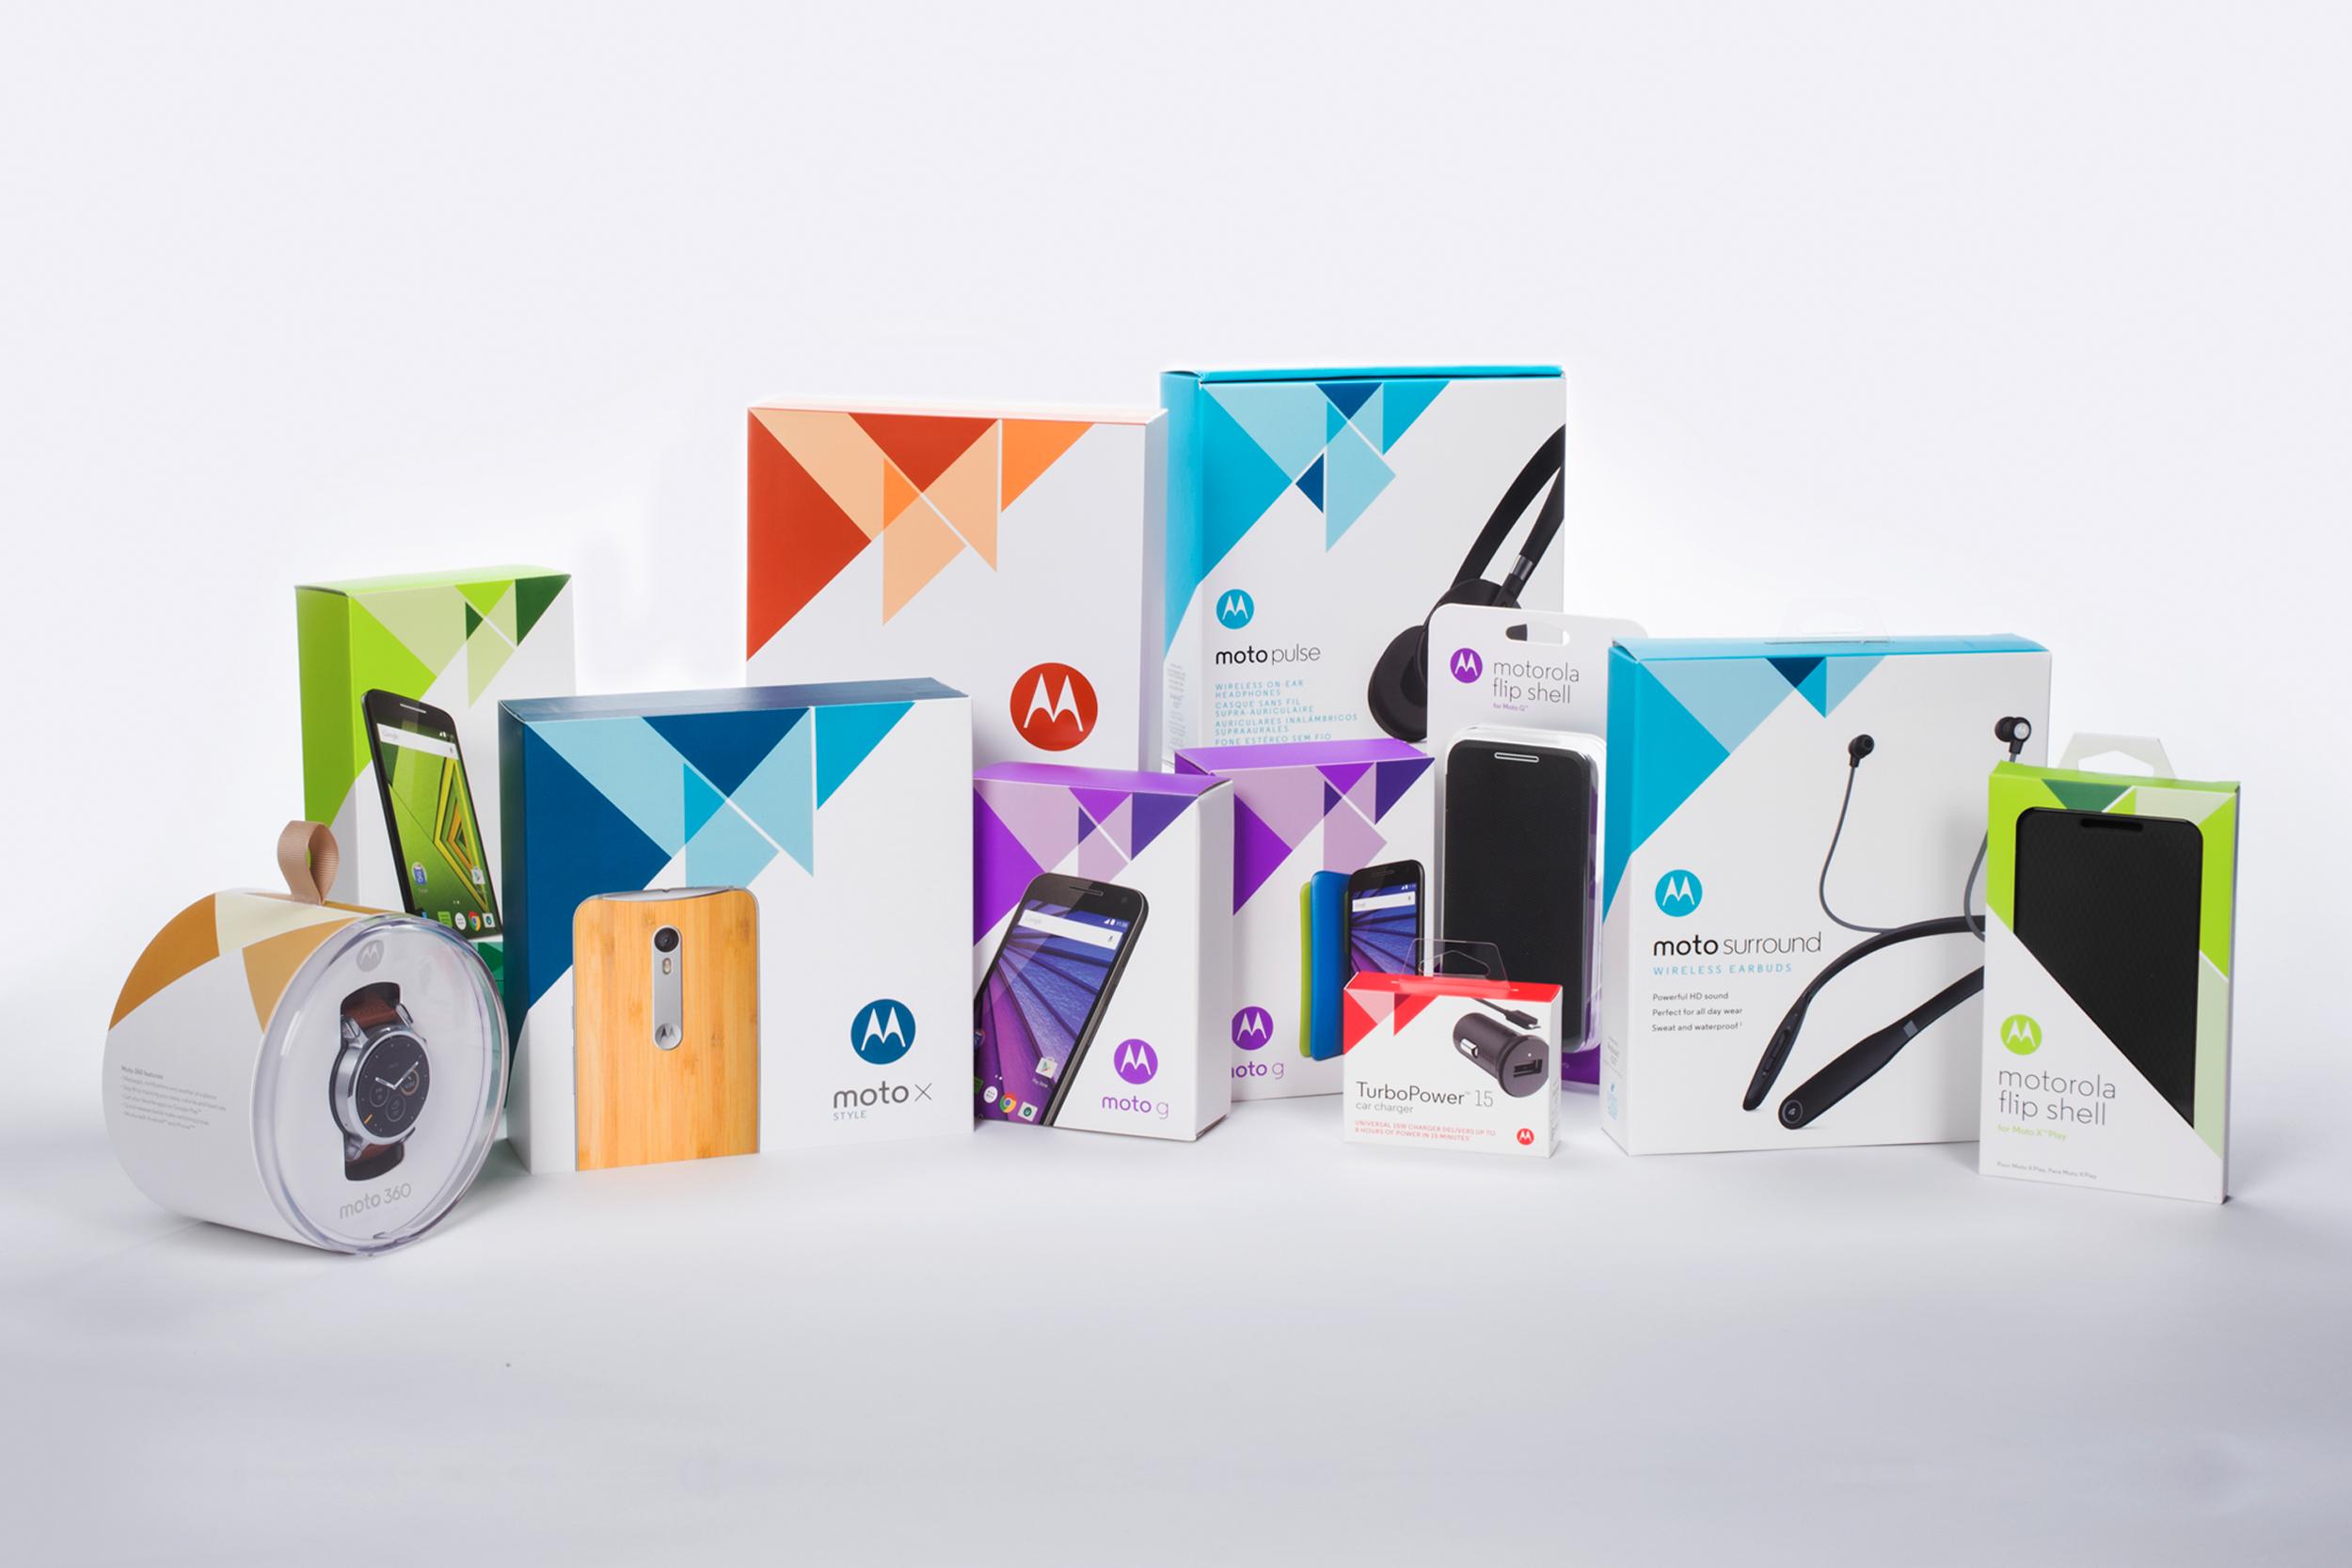 Motorola 2015 Packaging Portfolio  |  Packaging Structure Design